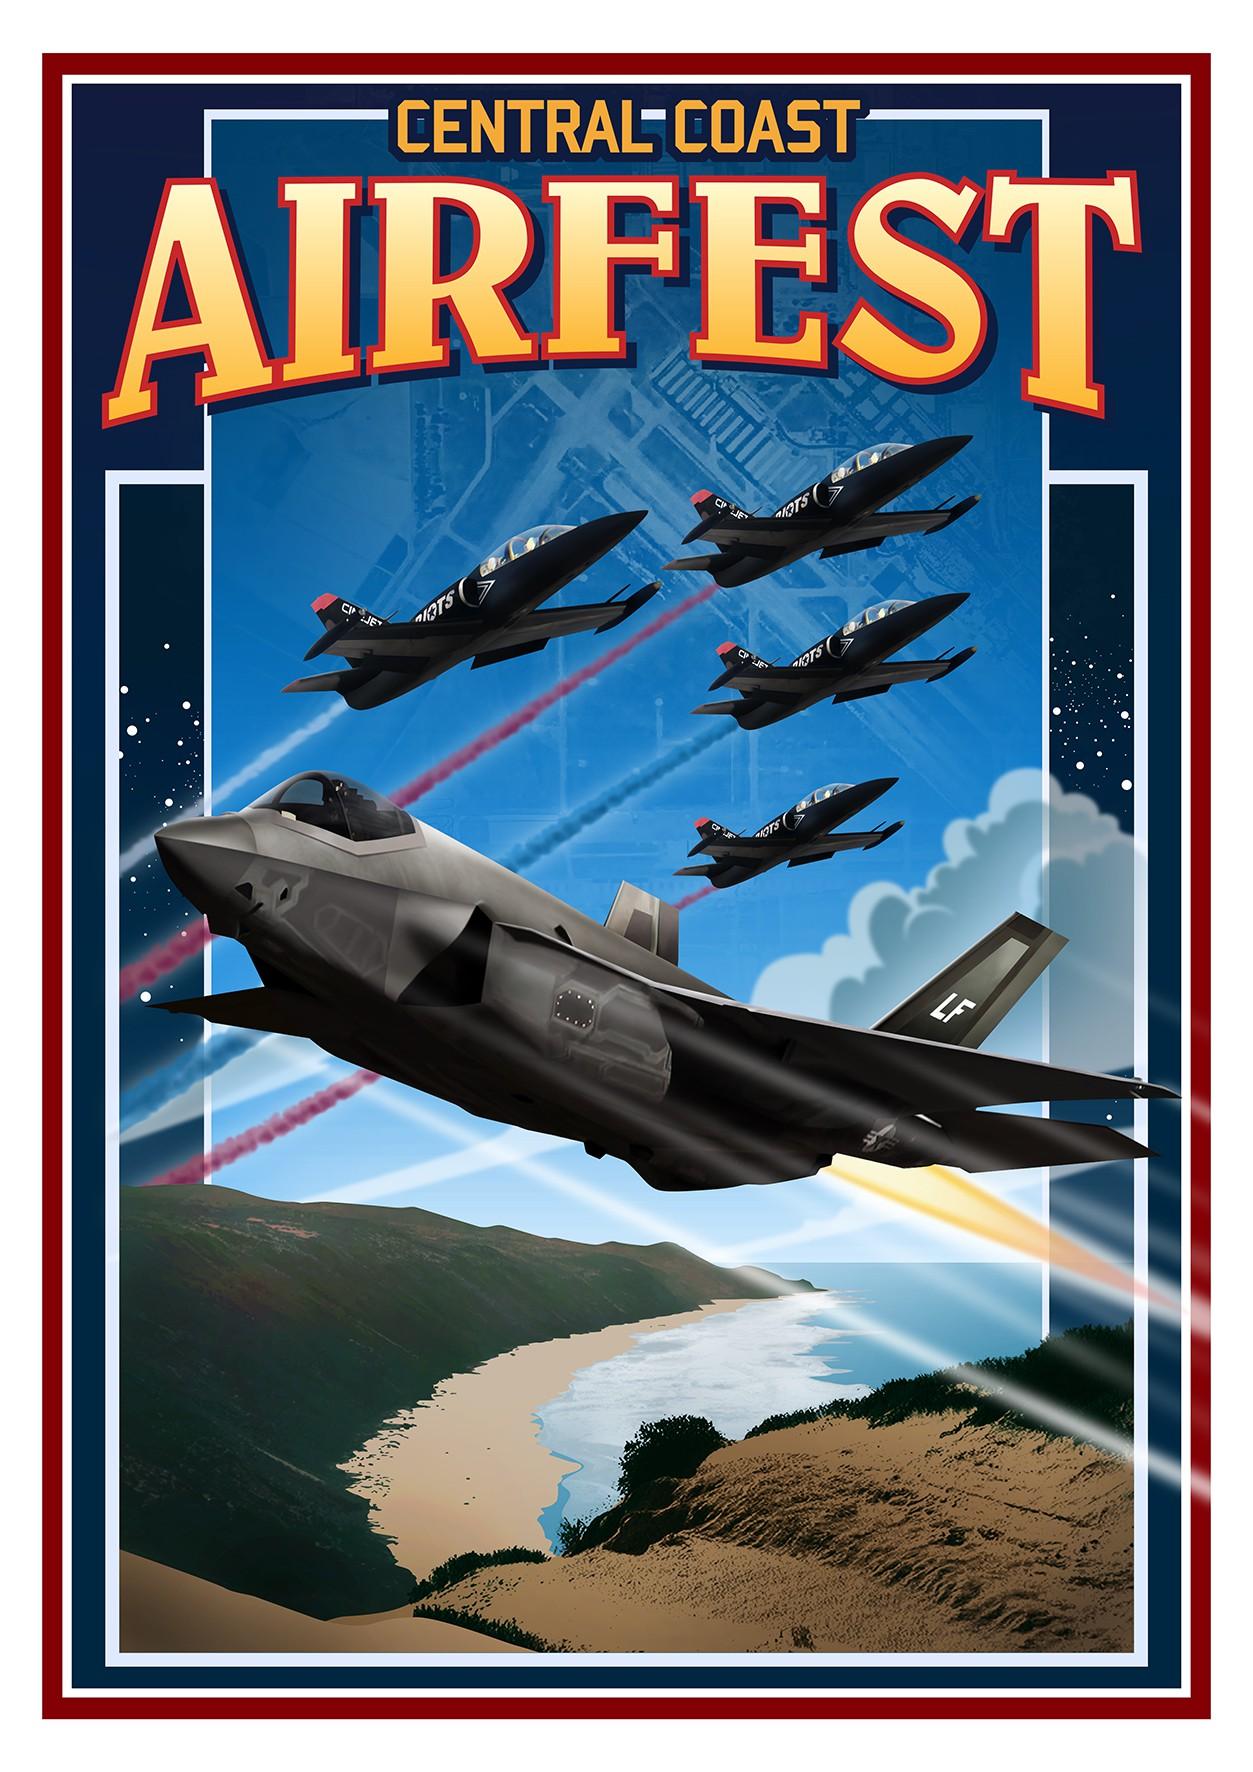 Central Coast AirFest 2020 Event Poster Artwork